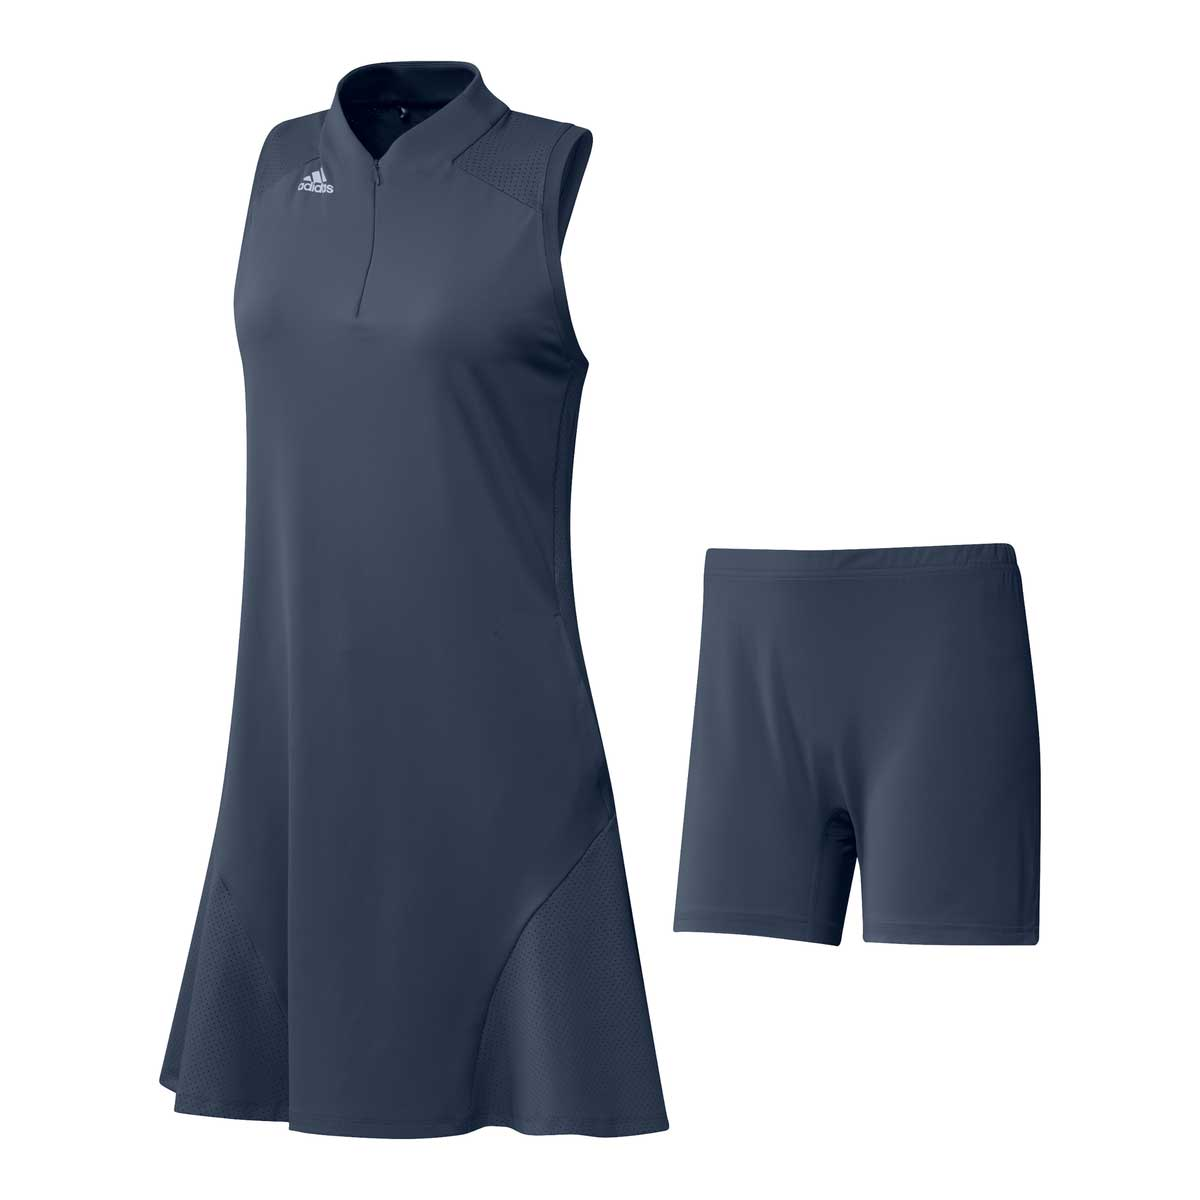 Adidas Women's Aeroready Sport Performance Sleeveless Crew Navy Dress